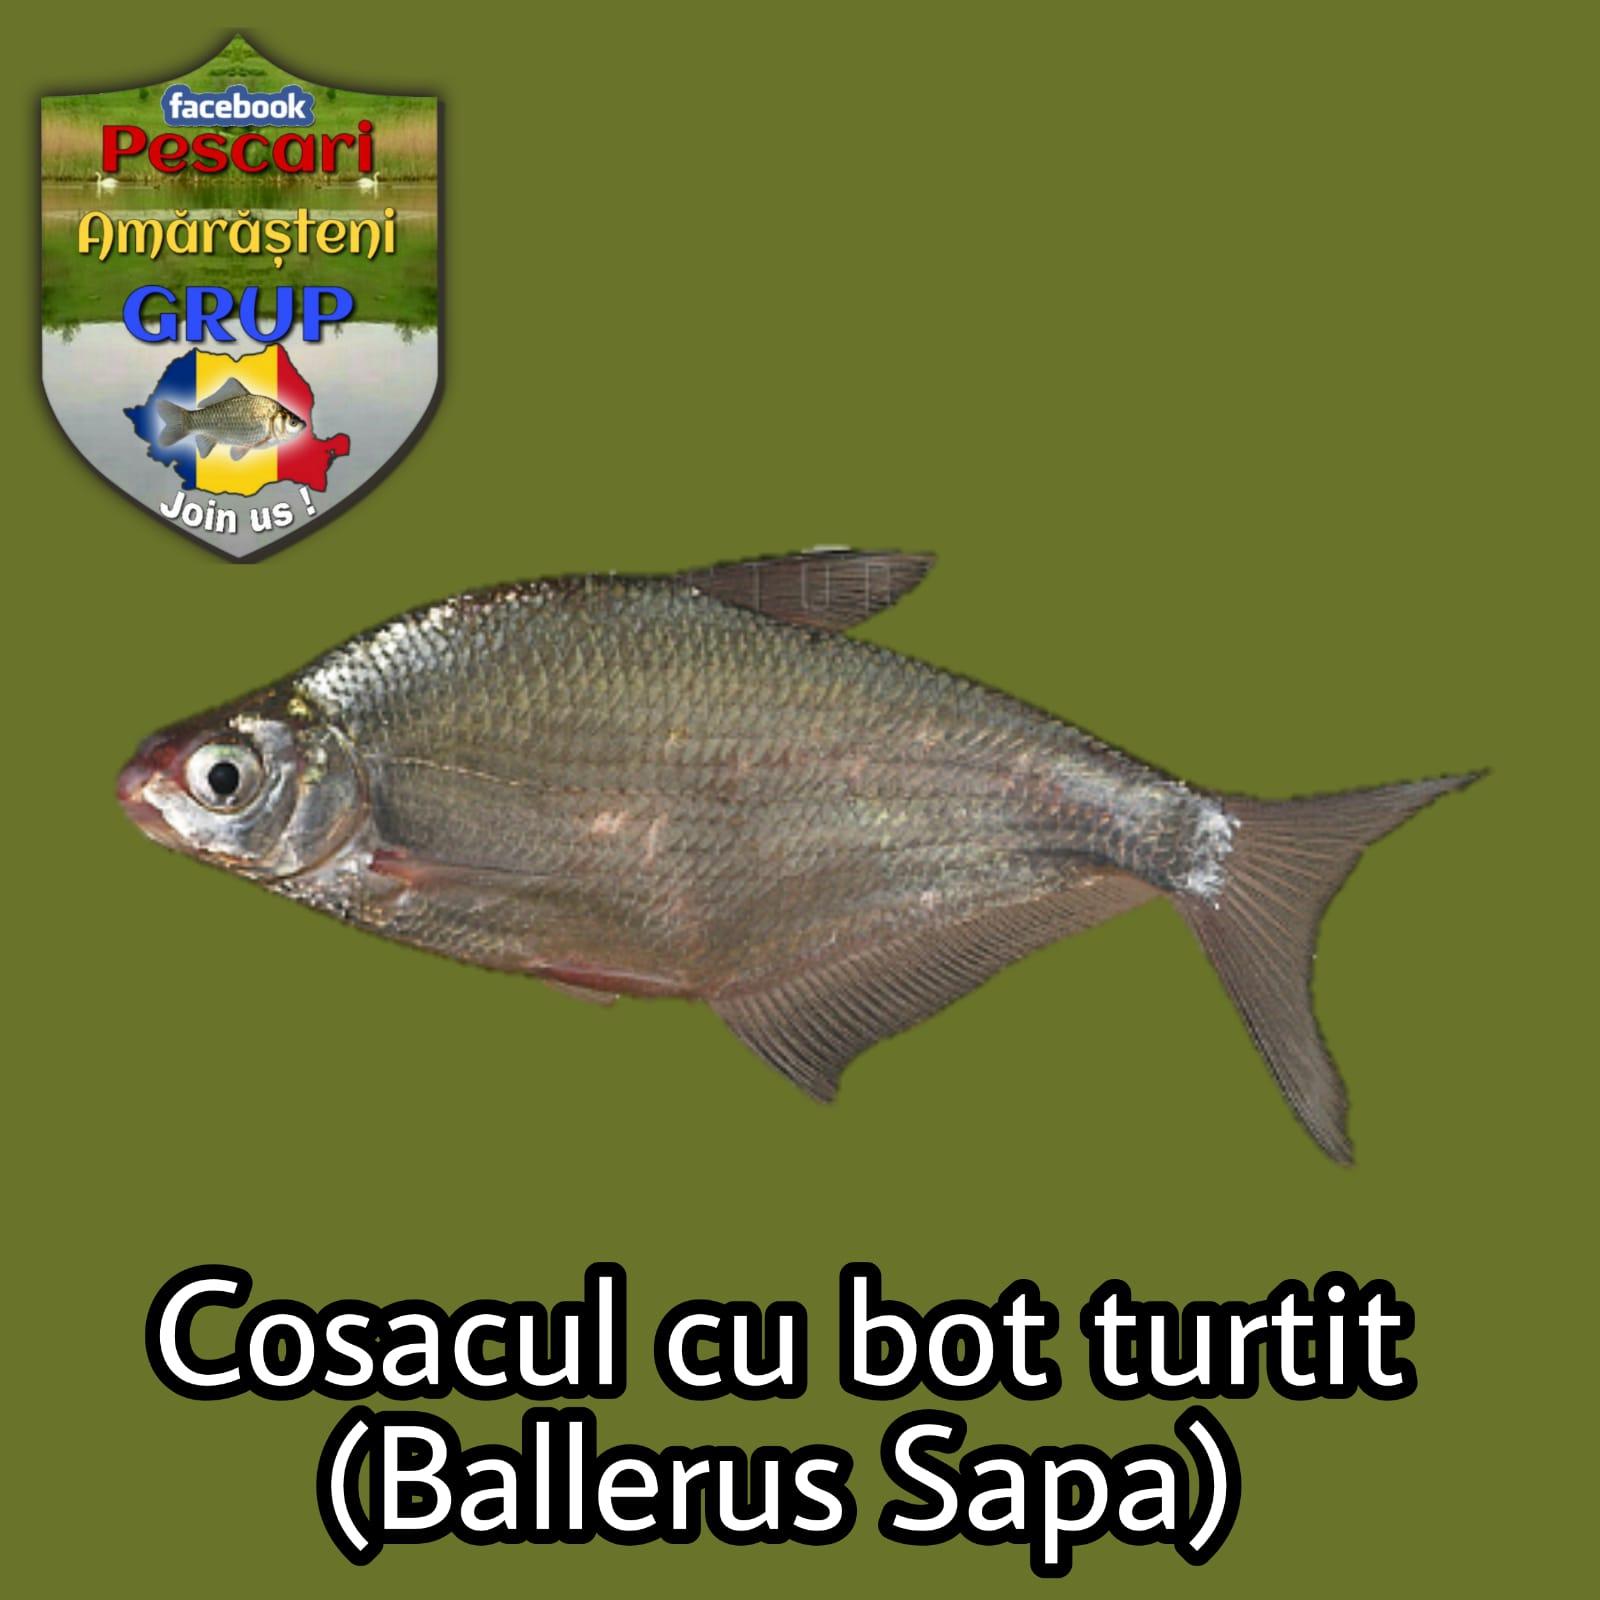 Cosacul cu bot turtit (Ballerus sapa)